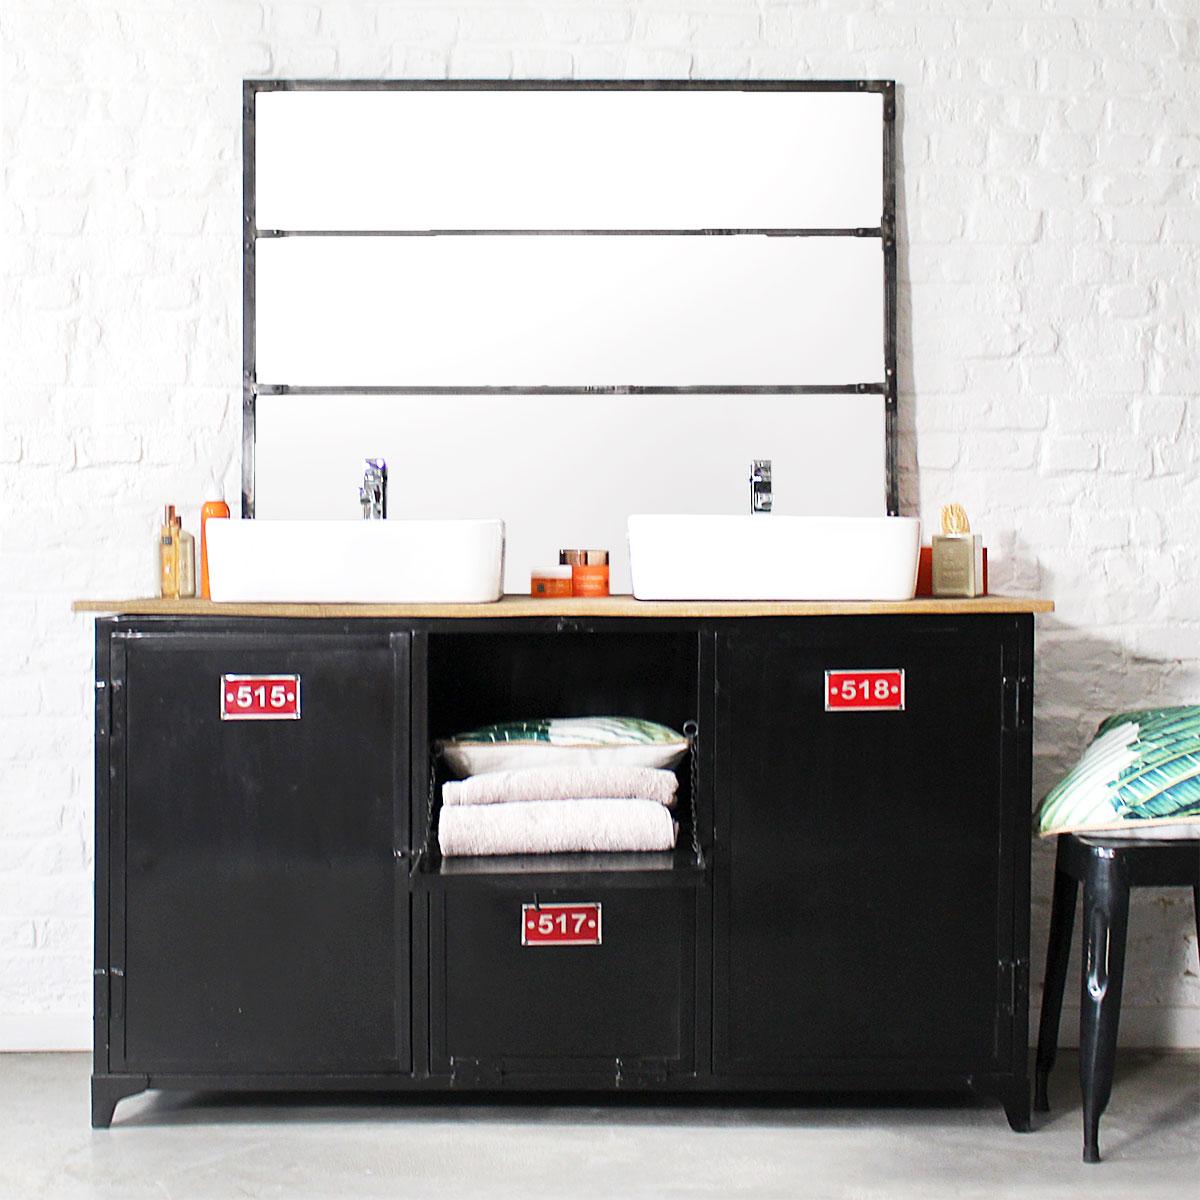 Conseils d co pour choisir son meuble salle de bain metal le blog d co de made in meubles - Meuble sdb ontwerpen ...